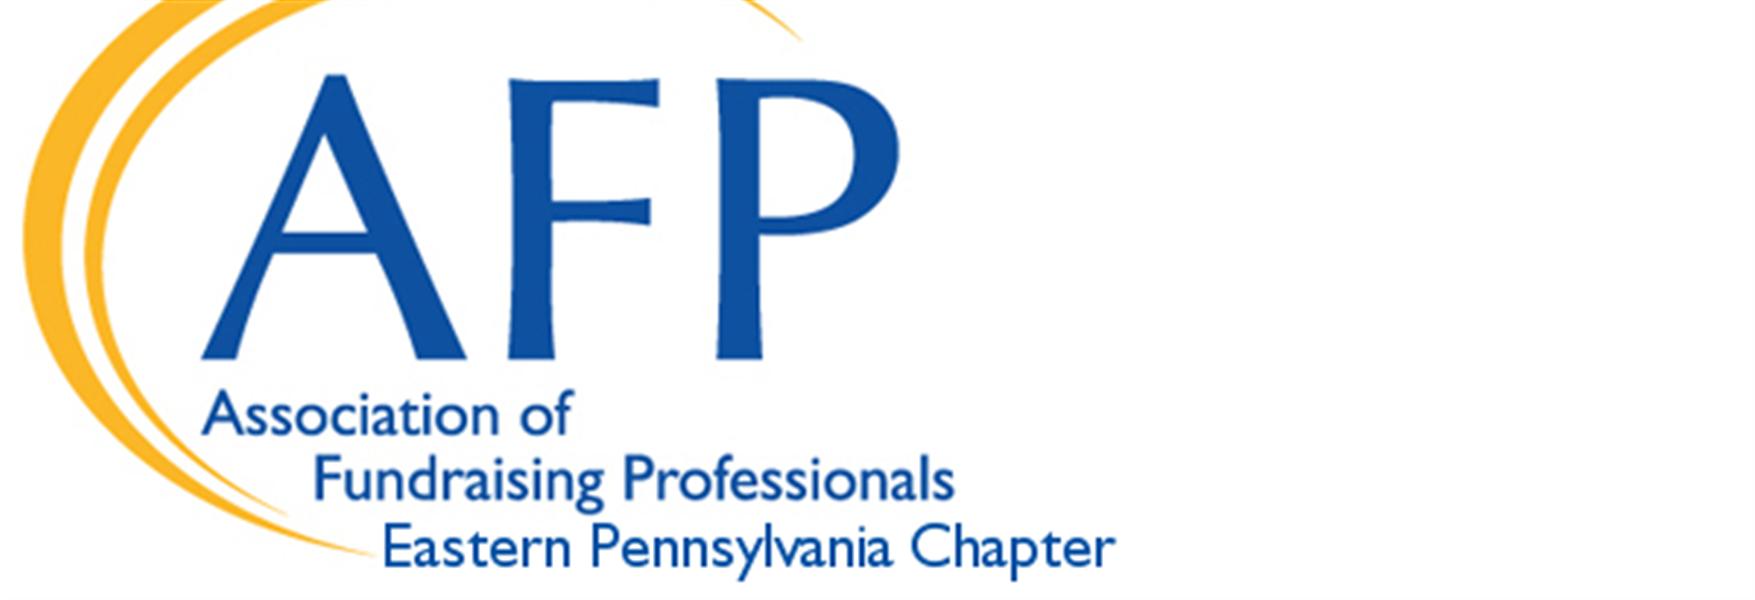 e85dc11c-5dfd-48c6-8308-fd895ae602af_AFP - EPA Logo.php.png